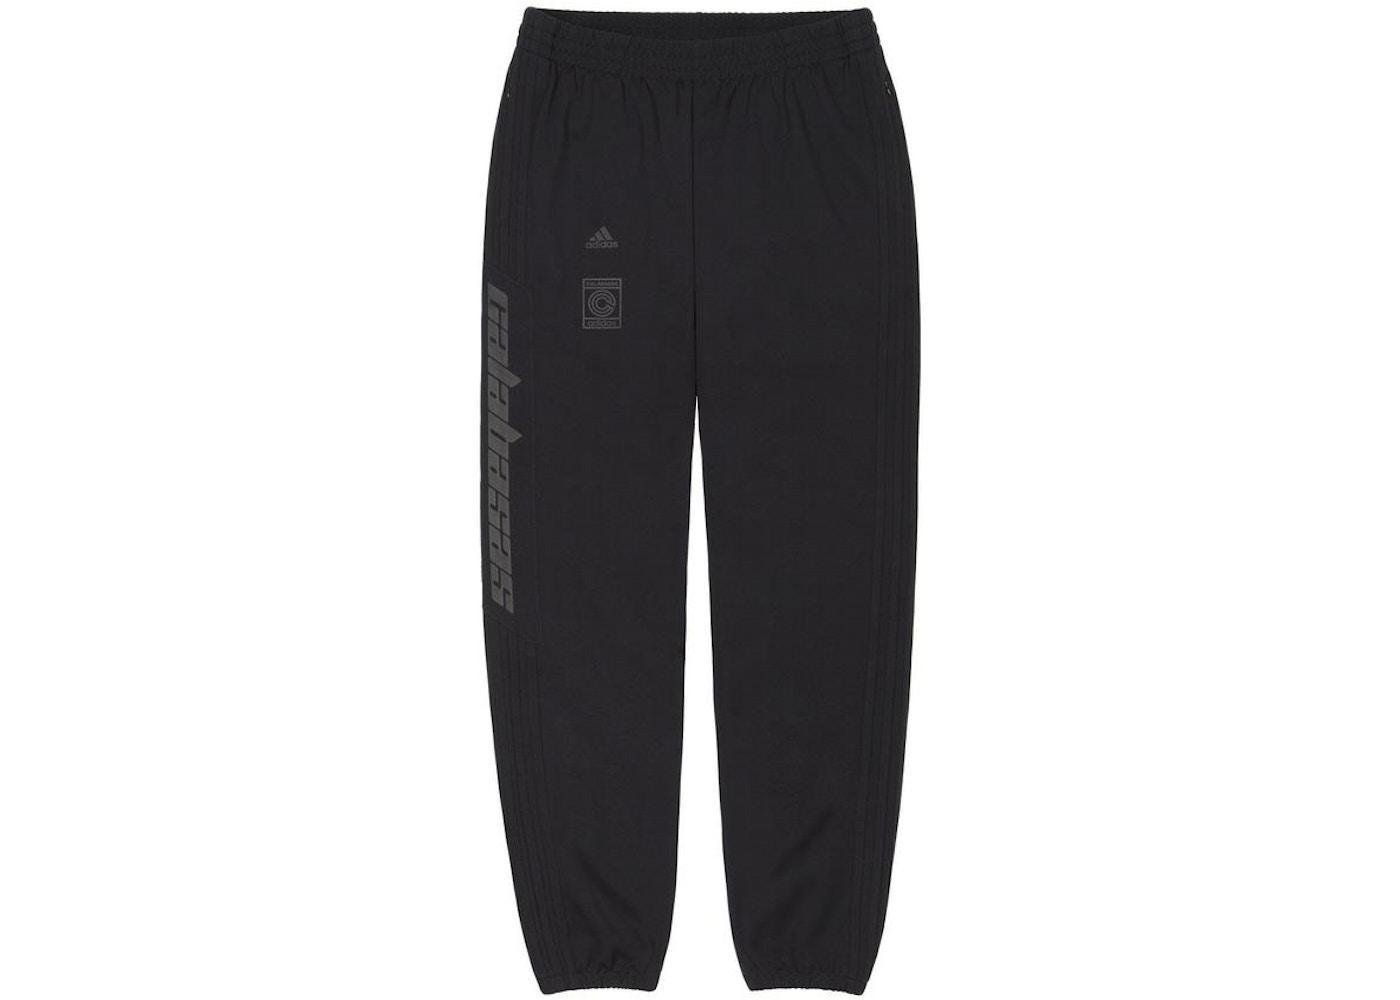 68a4ce2b9 adidas Yeezy Calabasas Track Pants Black Black - FW17